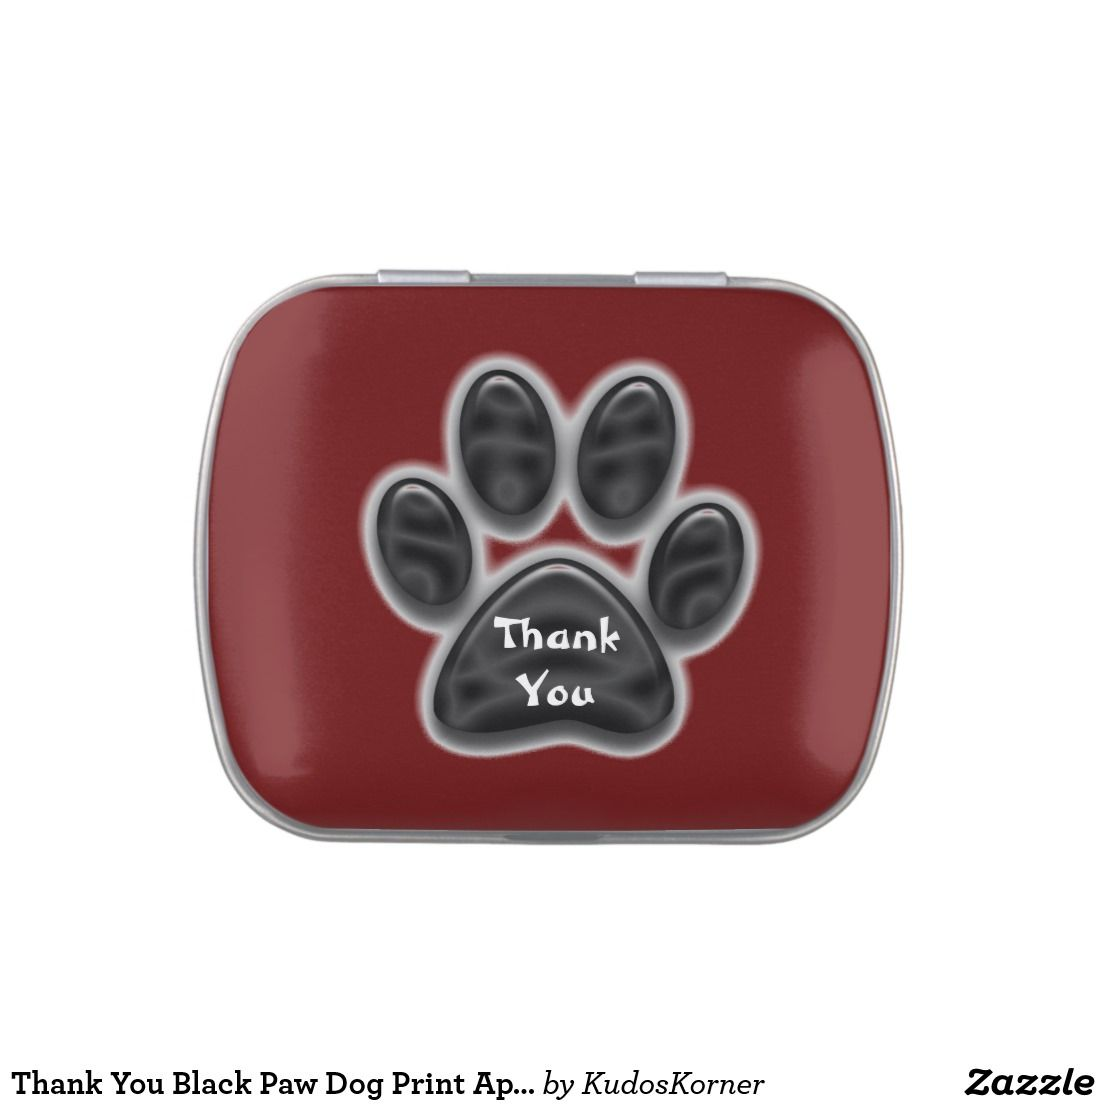 Thank You Black Paw Dog Print Appreciation Candy Tin Zazzle Com Dog Print Candy Tins Paw